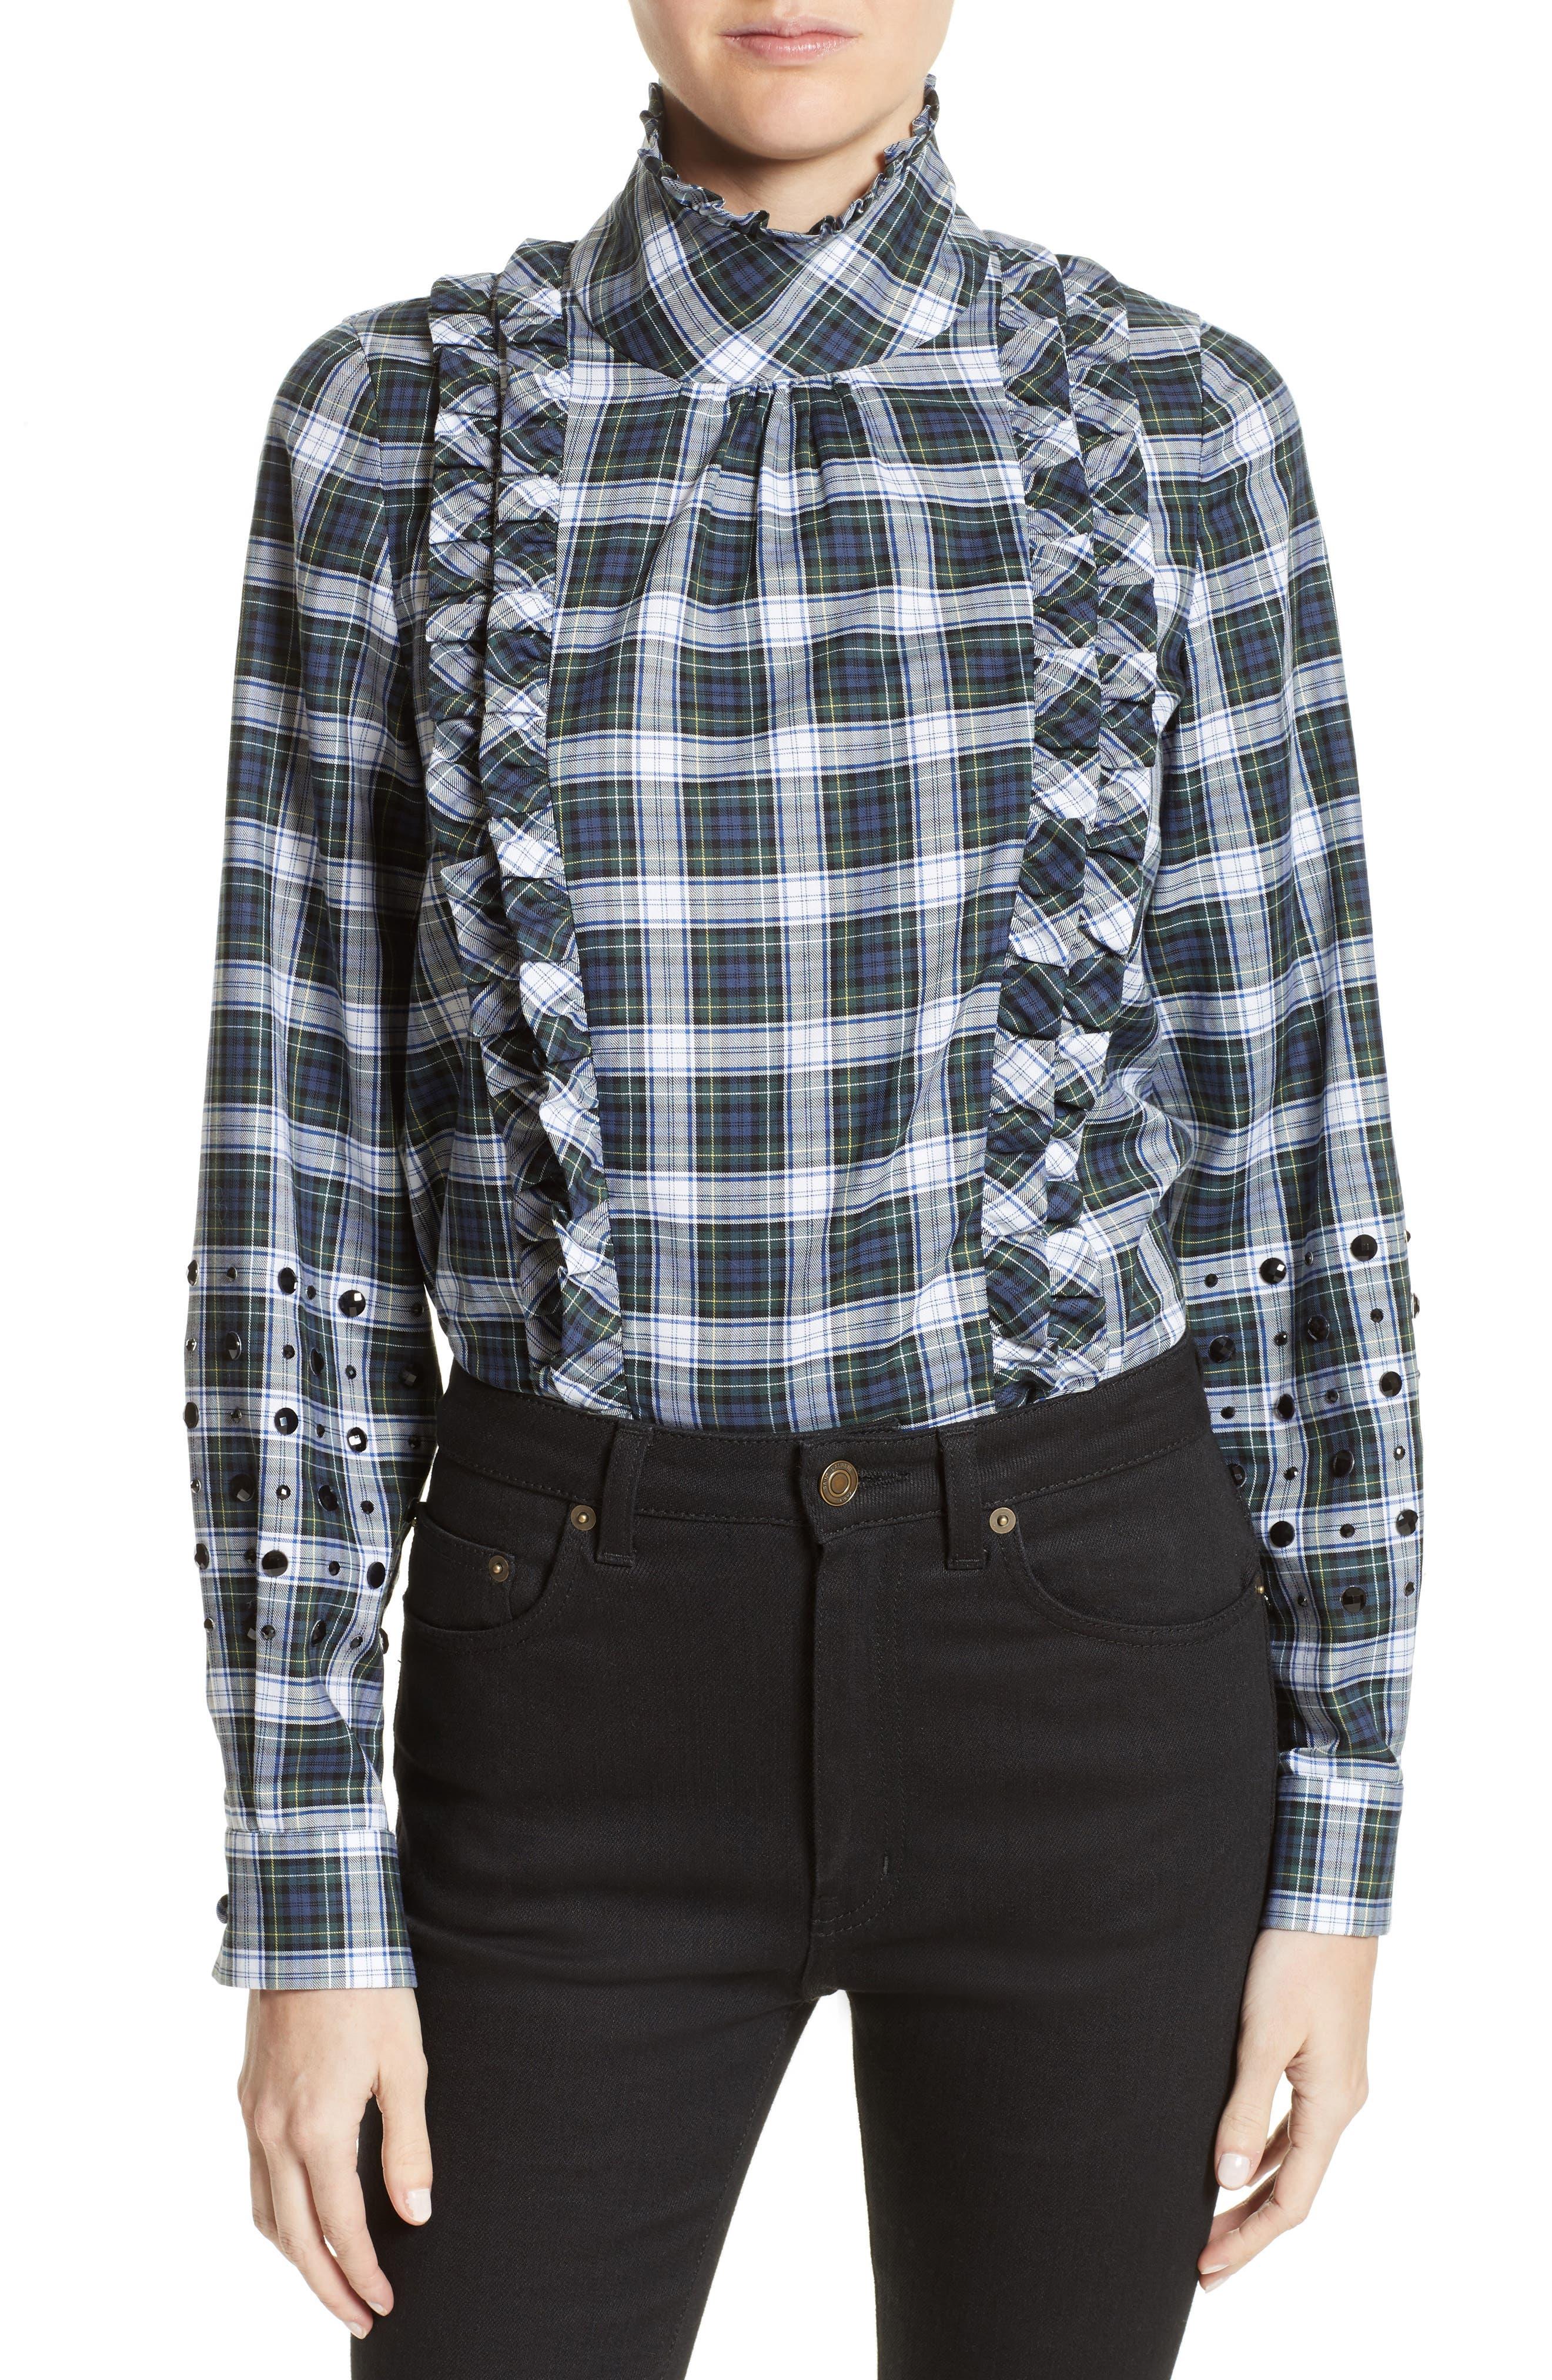 N°21 Crystal Embellished Plaid Shirt